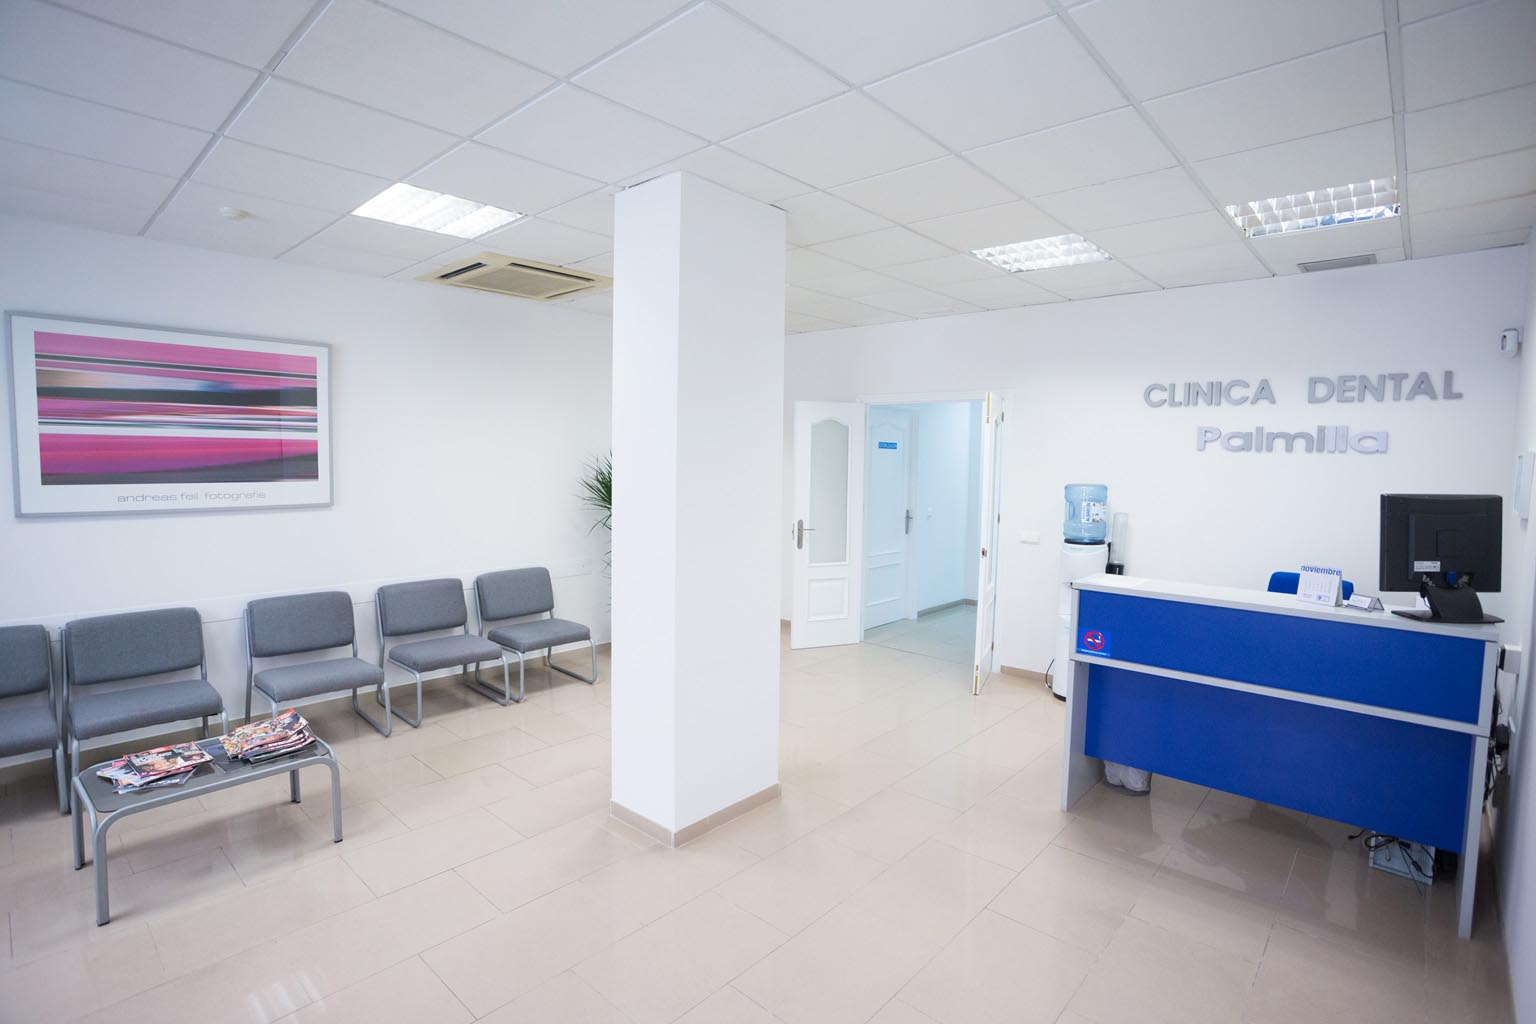 Interior Clínica dental en Almería - Clínica Dental Palmilla